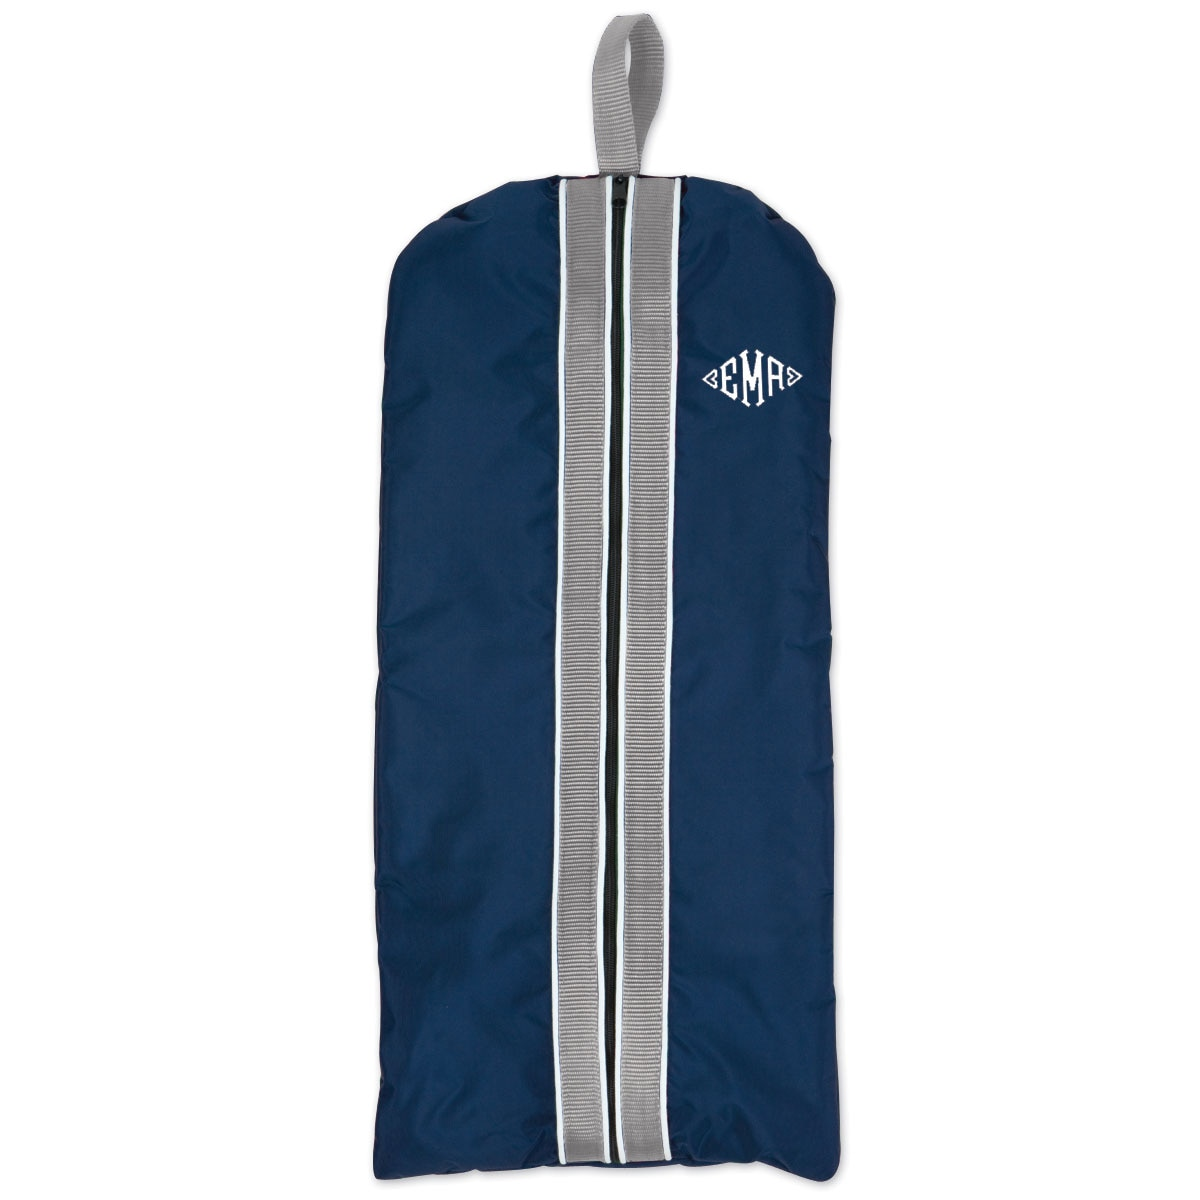 Smartpak Bridle Bag